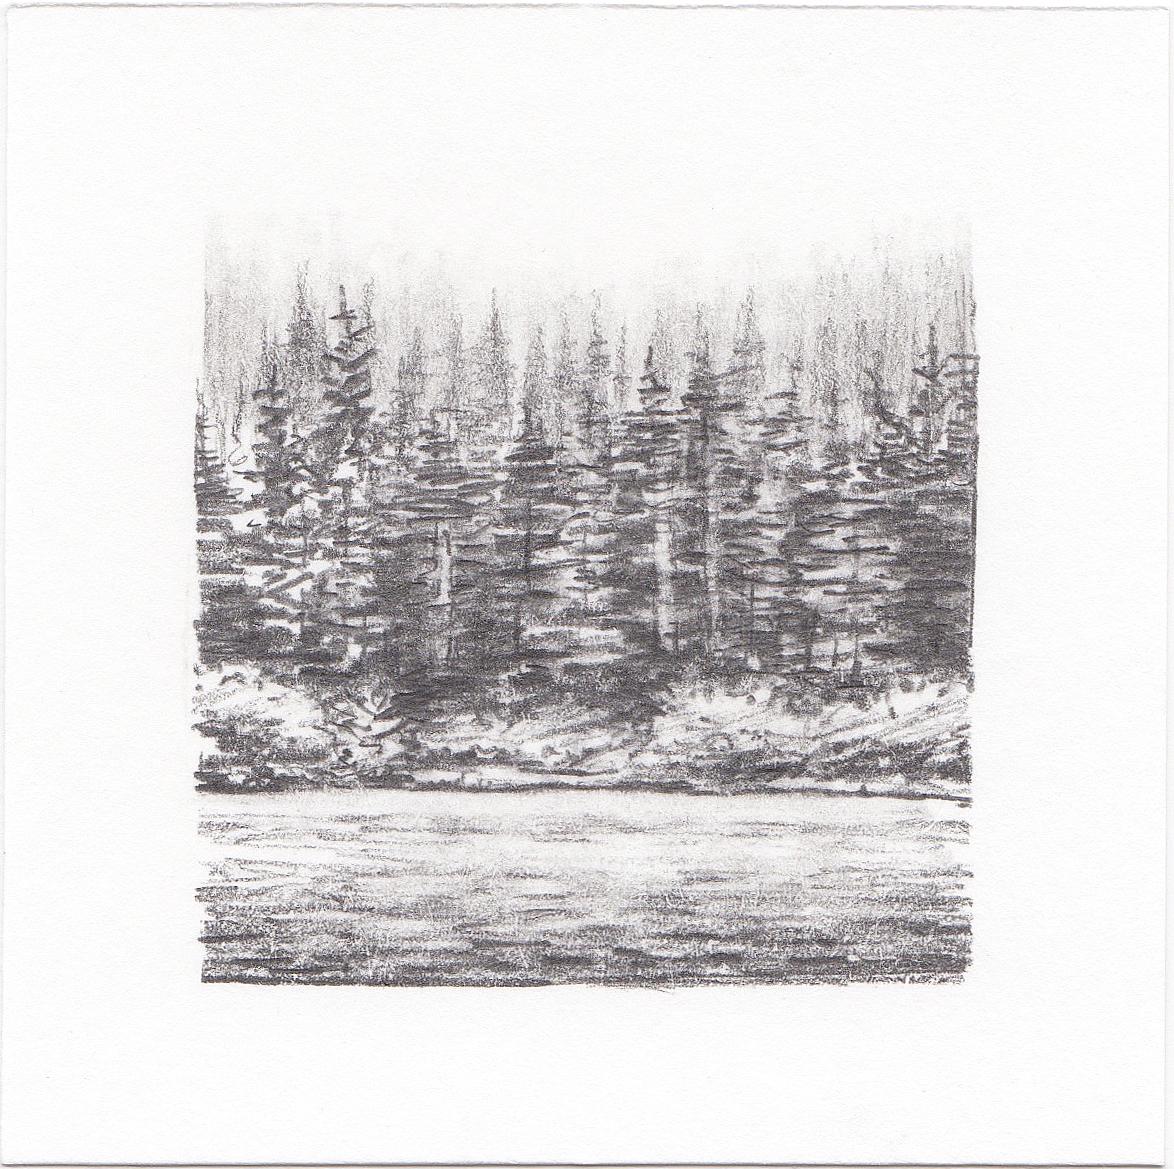 #44 Woods outside Portland, Oregon | 3x3 | graphite